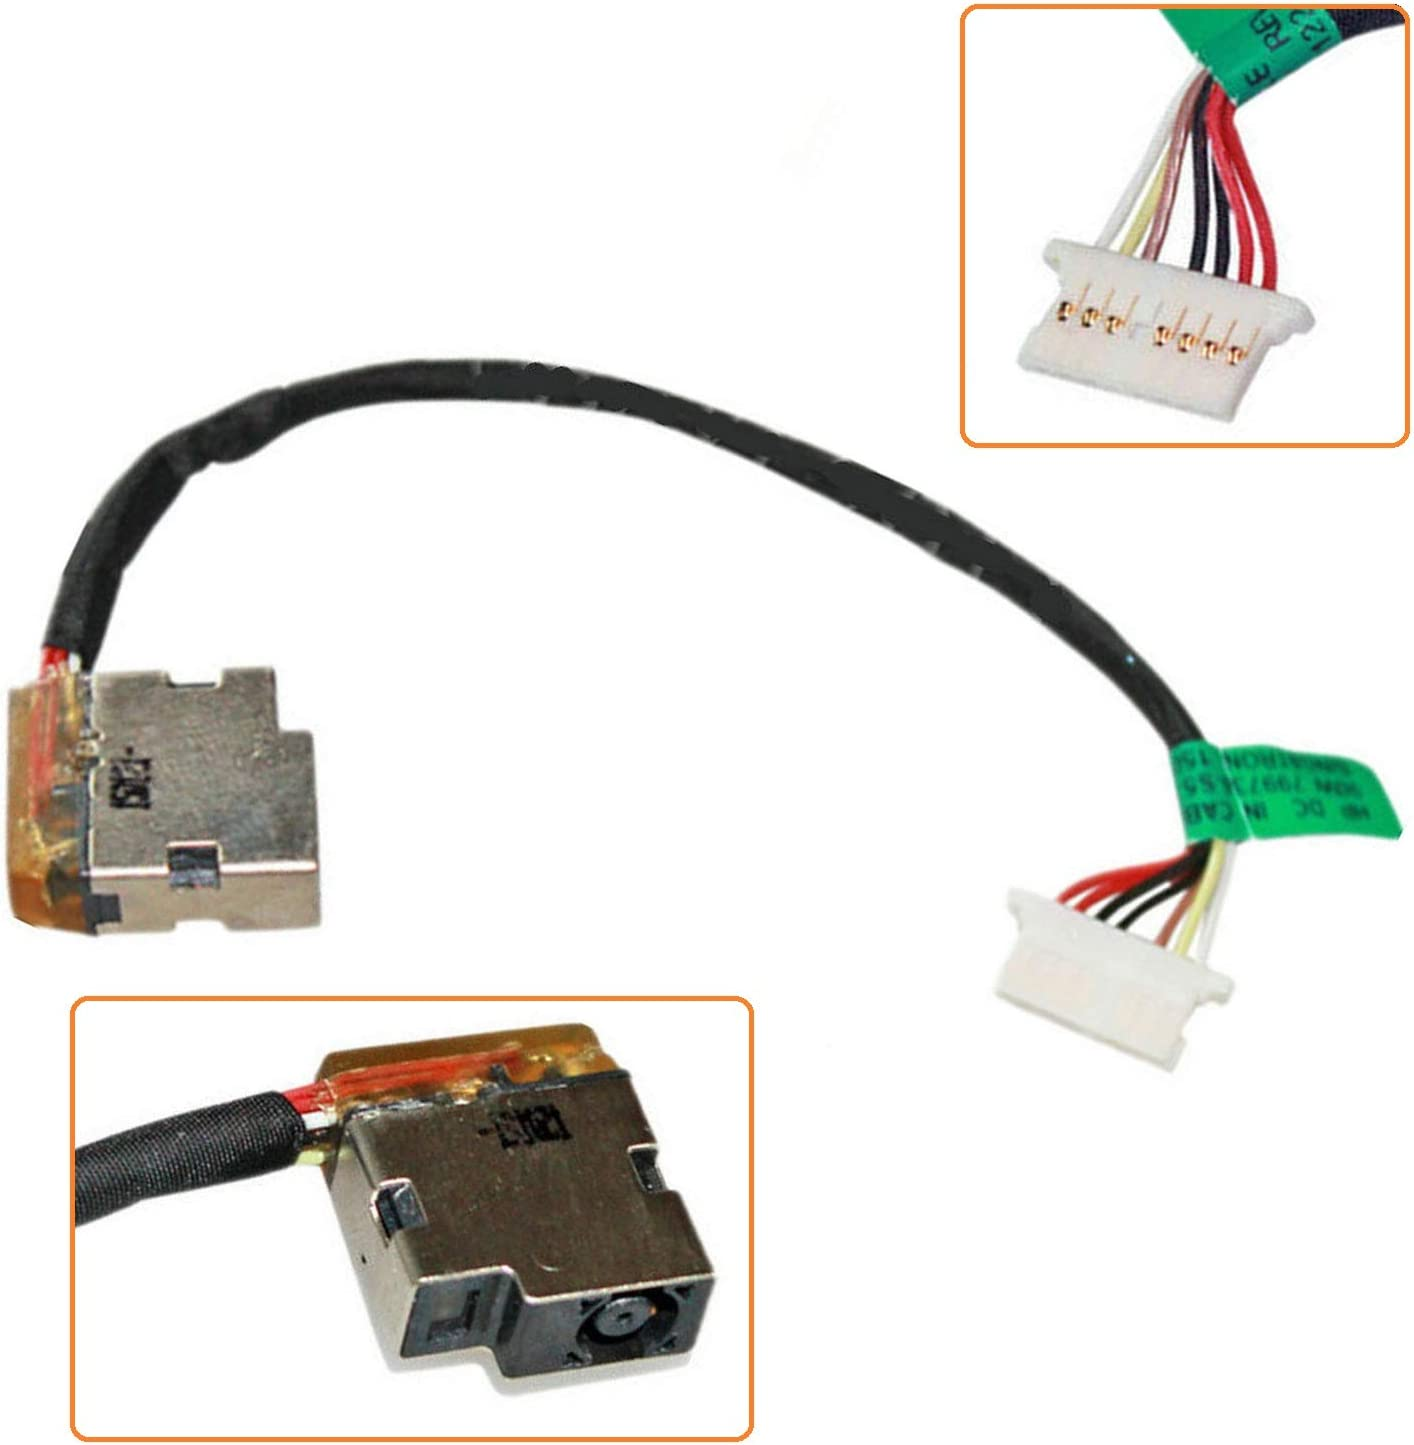 Todiys DC Power Jack Socket with Cable for HP 15-AC121CY 15-AC142DX 15-AF130CA 15-AY015DX 15-AY018NR 15-AY053CA 15-AY177CL 15-BA019NR 15-BA036CA 15-BA052WM 15-BN070WM 799736-F57